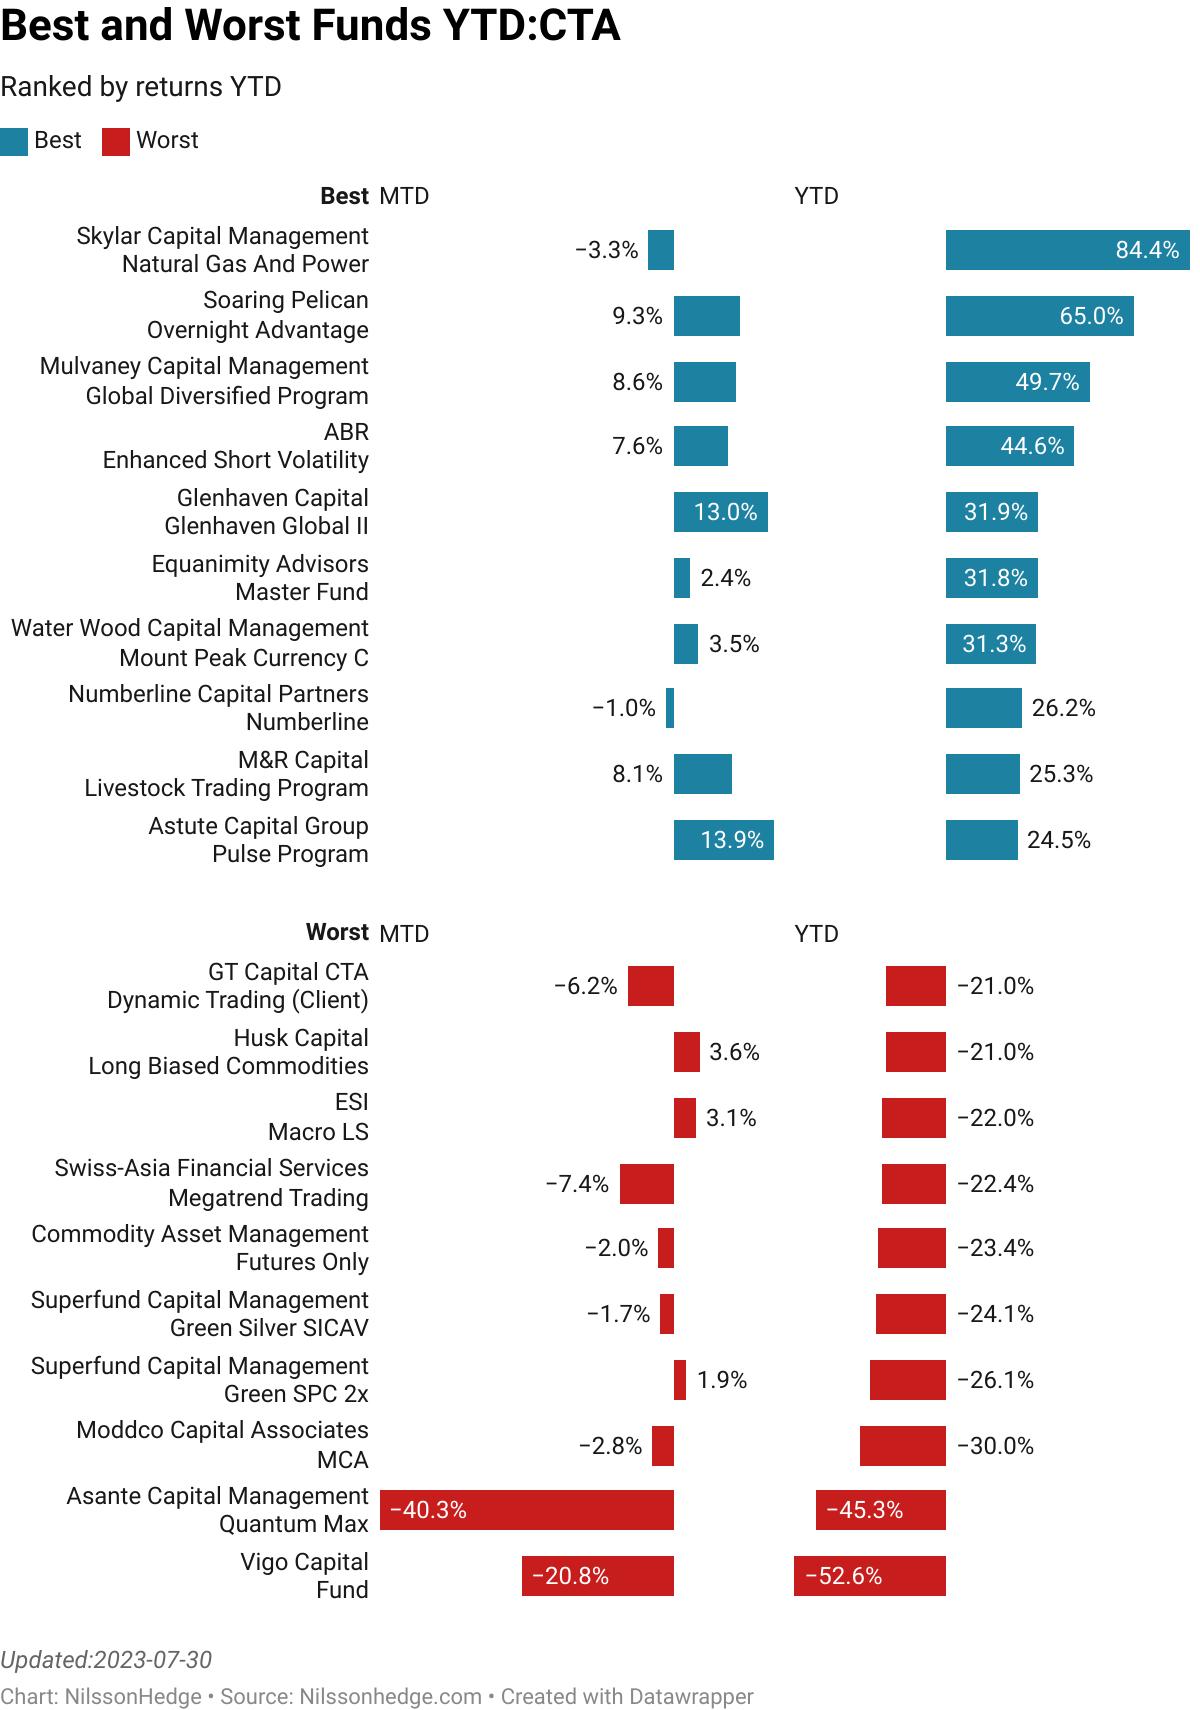 World Cup Advisor : Jorg Diemand Volatility Patterns  :  7.85% [0.05]<br> Martin Fund Management : Martin Options Program  :  2.83% [69.00]<br> Meyers Capital Management : Meyers Capital Management  :  4.97% [1.90]<br> RCMA Capital : Merchant Commodity Fund  :  5.70% [237.00]<br> Kopis Capital Management : Commodity Long Short  :  12.20% [0.71]<br> AIS Capital Management : MAAP 3-6X  :  -4.33% [45.10]<br> Glenhaven Capital : Glenhaven Global II  :  -5.64% [4.60]<br> GAIA Capital Management : GAIA FX+  :  3.07% [63.15]<br> Alpha Kairos Asset Management : Acclivity Prop  :  5.41% [0.00]<br> Alpha Kairos Asset Management : Acclivity Sys  :  8.97% [0.00]<br> Asset Management by Windsor Securities : Broad Heuristic Tactical Strategy  :  0.76% [27.20]<br> Auspice Capital Advisors : Short Term (AST)  :  0.28% [11.60]<br> WG Wealth Guardian : GVR Program  :  -0.03% [1.20]<br> Hornsby & Company : Ryan Alderson Intermediate Swing  :  -6.17% [0.03]<br> World Cup Advisor : Paige Williams Day Trader  :  -18.26% [0.01]<br> World Cup Advisor : Jan Smolen Gold Standard Program  :  -4.61% [0.00]<br> World Cup Advisor : Petra Ilona Zacek Eclipse  :  -10.71% [0.01]<br> World Cup Advisor : Sebastian Baumgaertel Target Zones  :  -32.95% [0.01]<br> World Cup Advisor : Yuwen Cao CC US Futures  :  -0.55% [0.02]<br> World Cup Advisor : Asset Risk Manager  :  -2.77% [0.02]<br> >